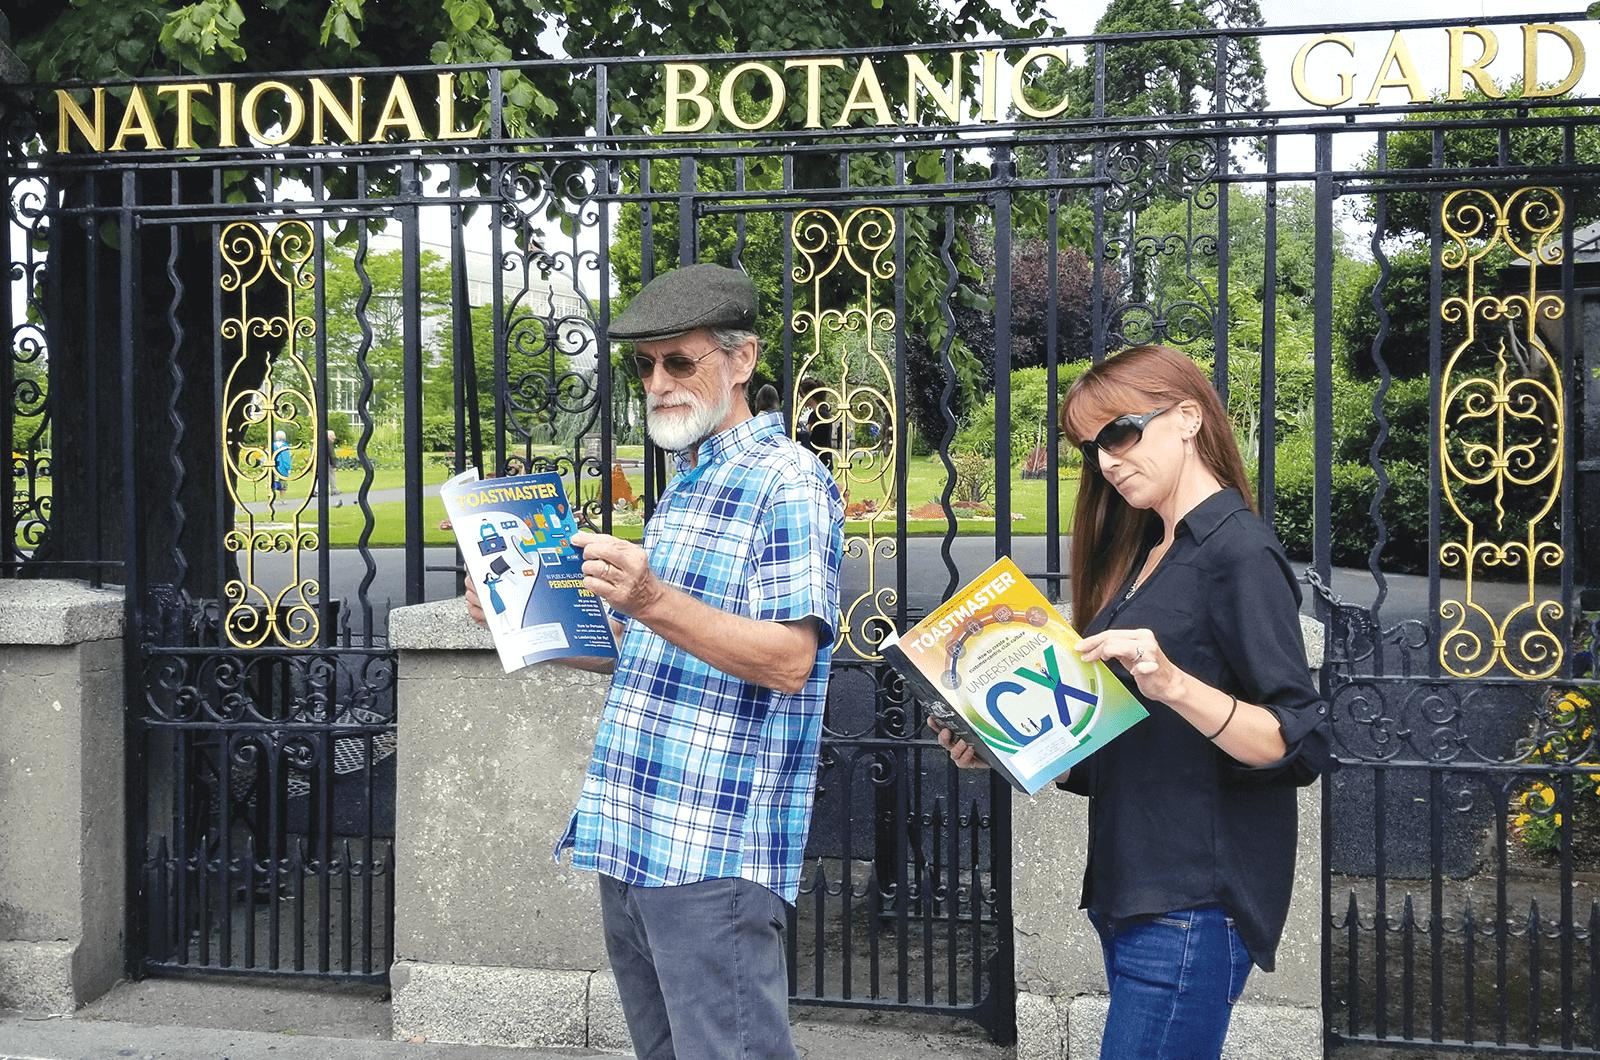 John Mullins and his daughter, Caroline Mullins-Erro, of Modesto, California, visit the National Botanic Gardens in Dublin, Ireland.